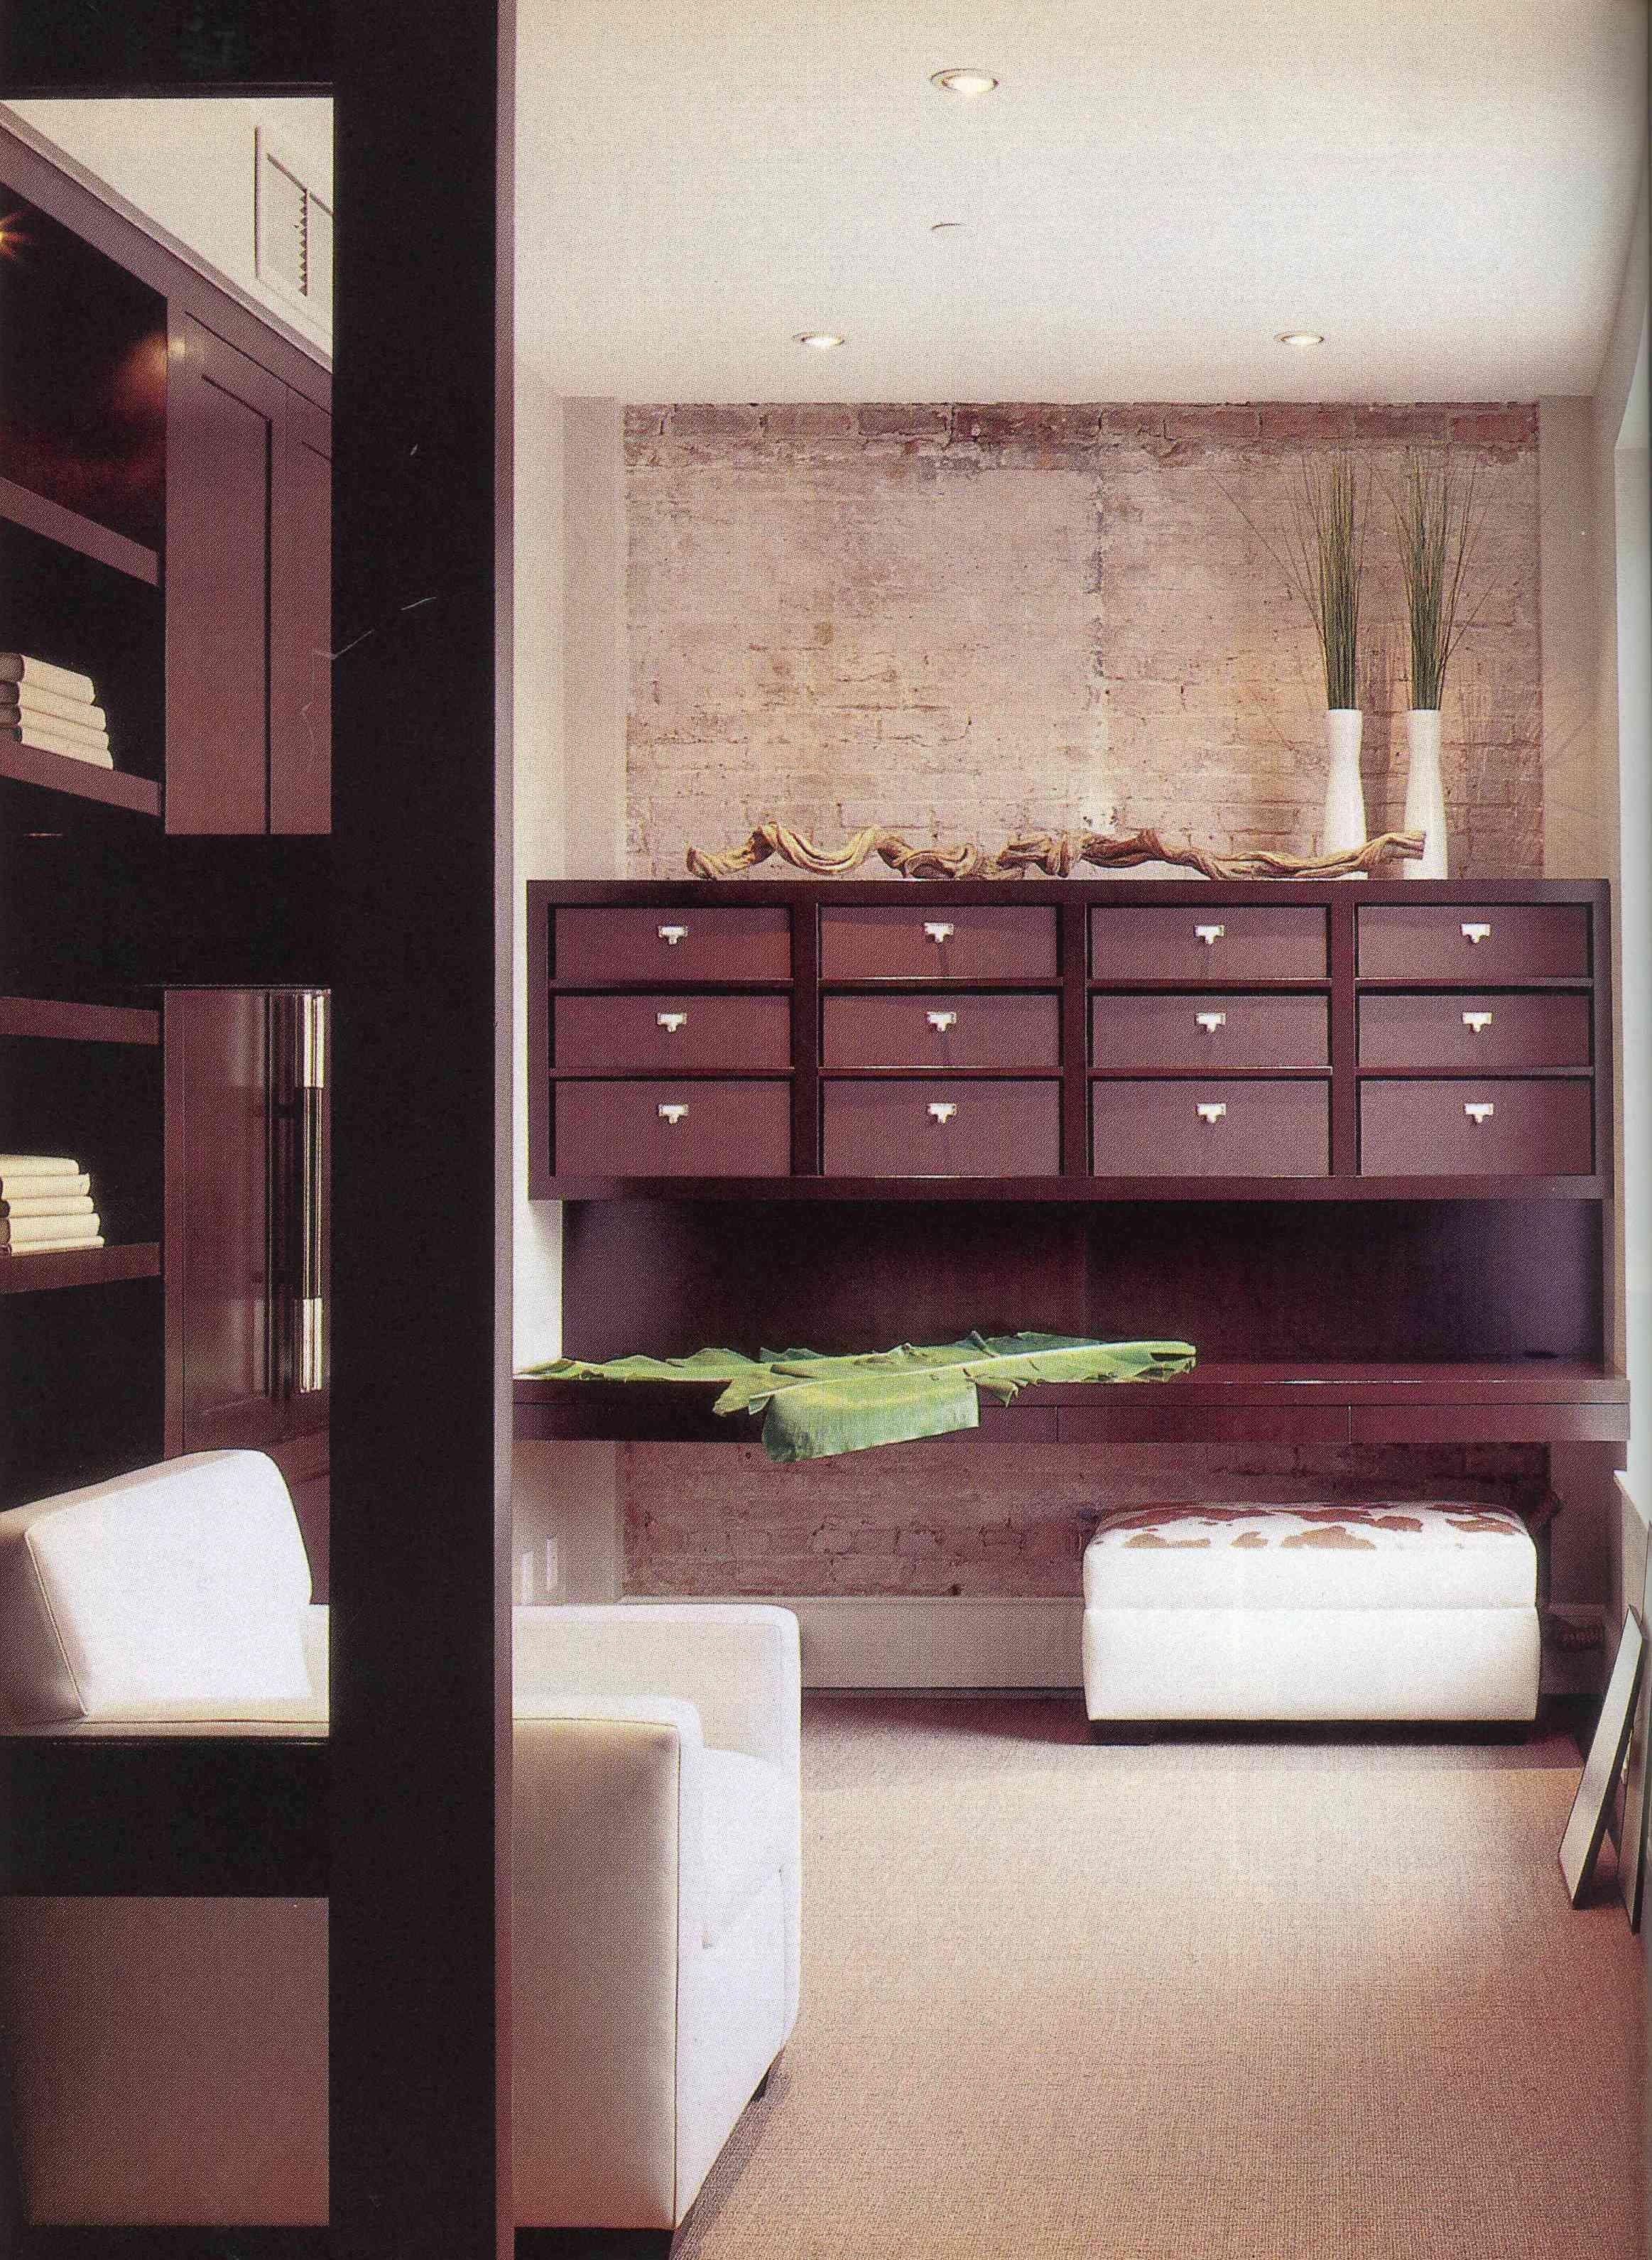 Interior Design_Nov 01_Savoy_Full Article_Page_6.jpg